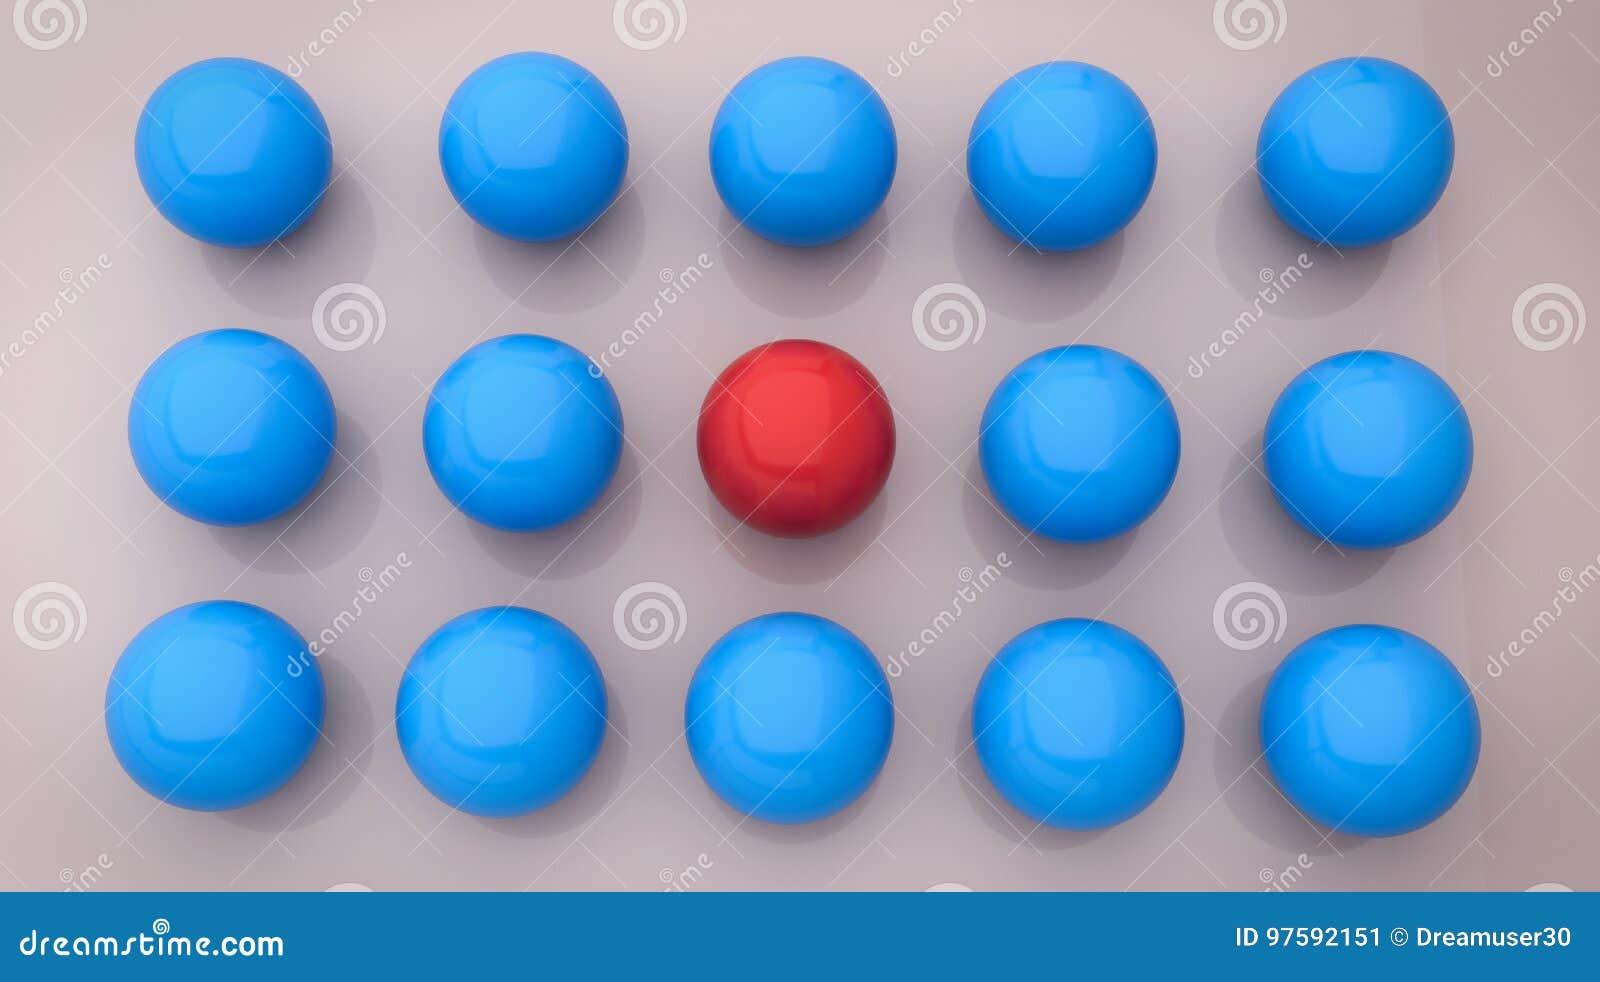 3d rendered balls